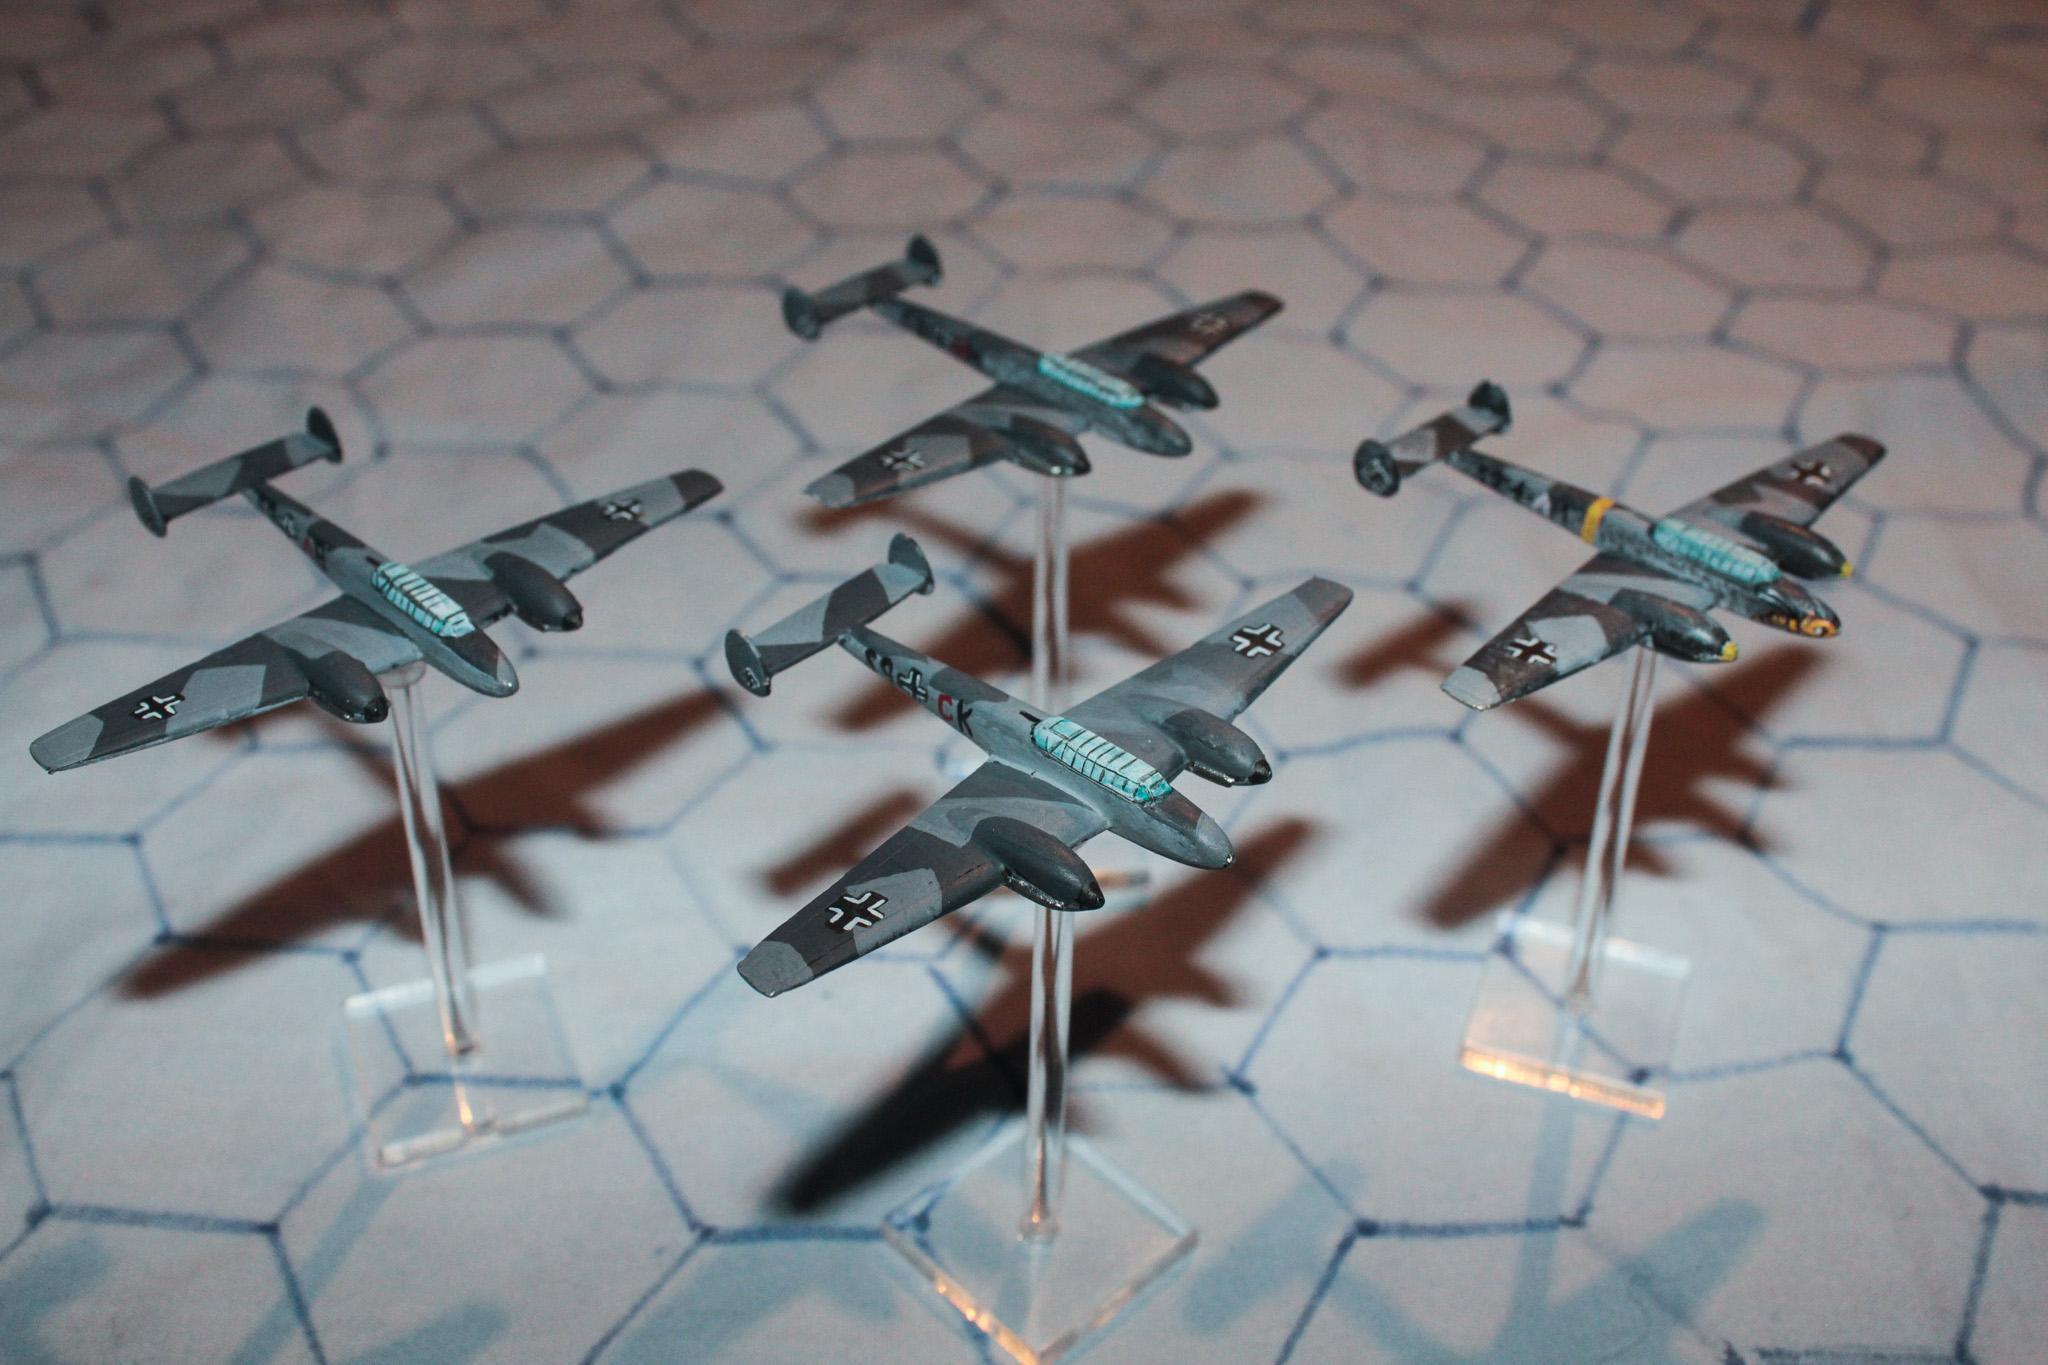 1:300, 6mm, Air Combat, Airborne, Aircraft, Airplane, Aviation, Check Your 6!, Fliers, Luftwaffe, Nazi, Planes, World War 2